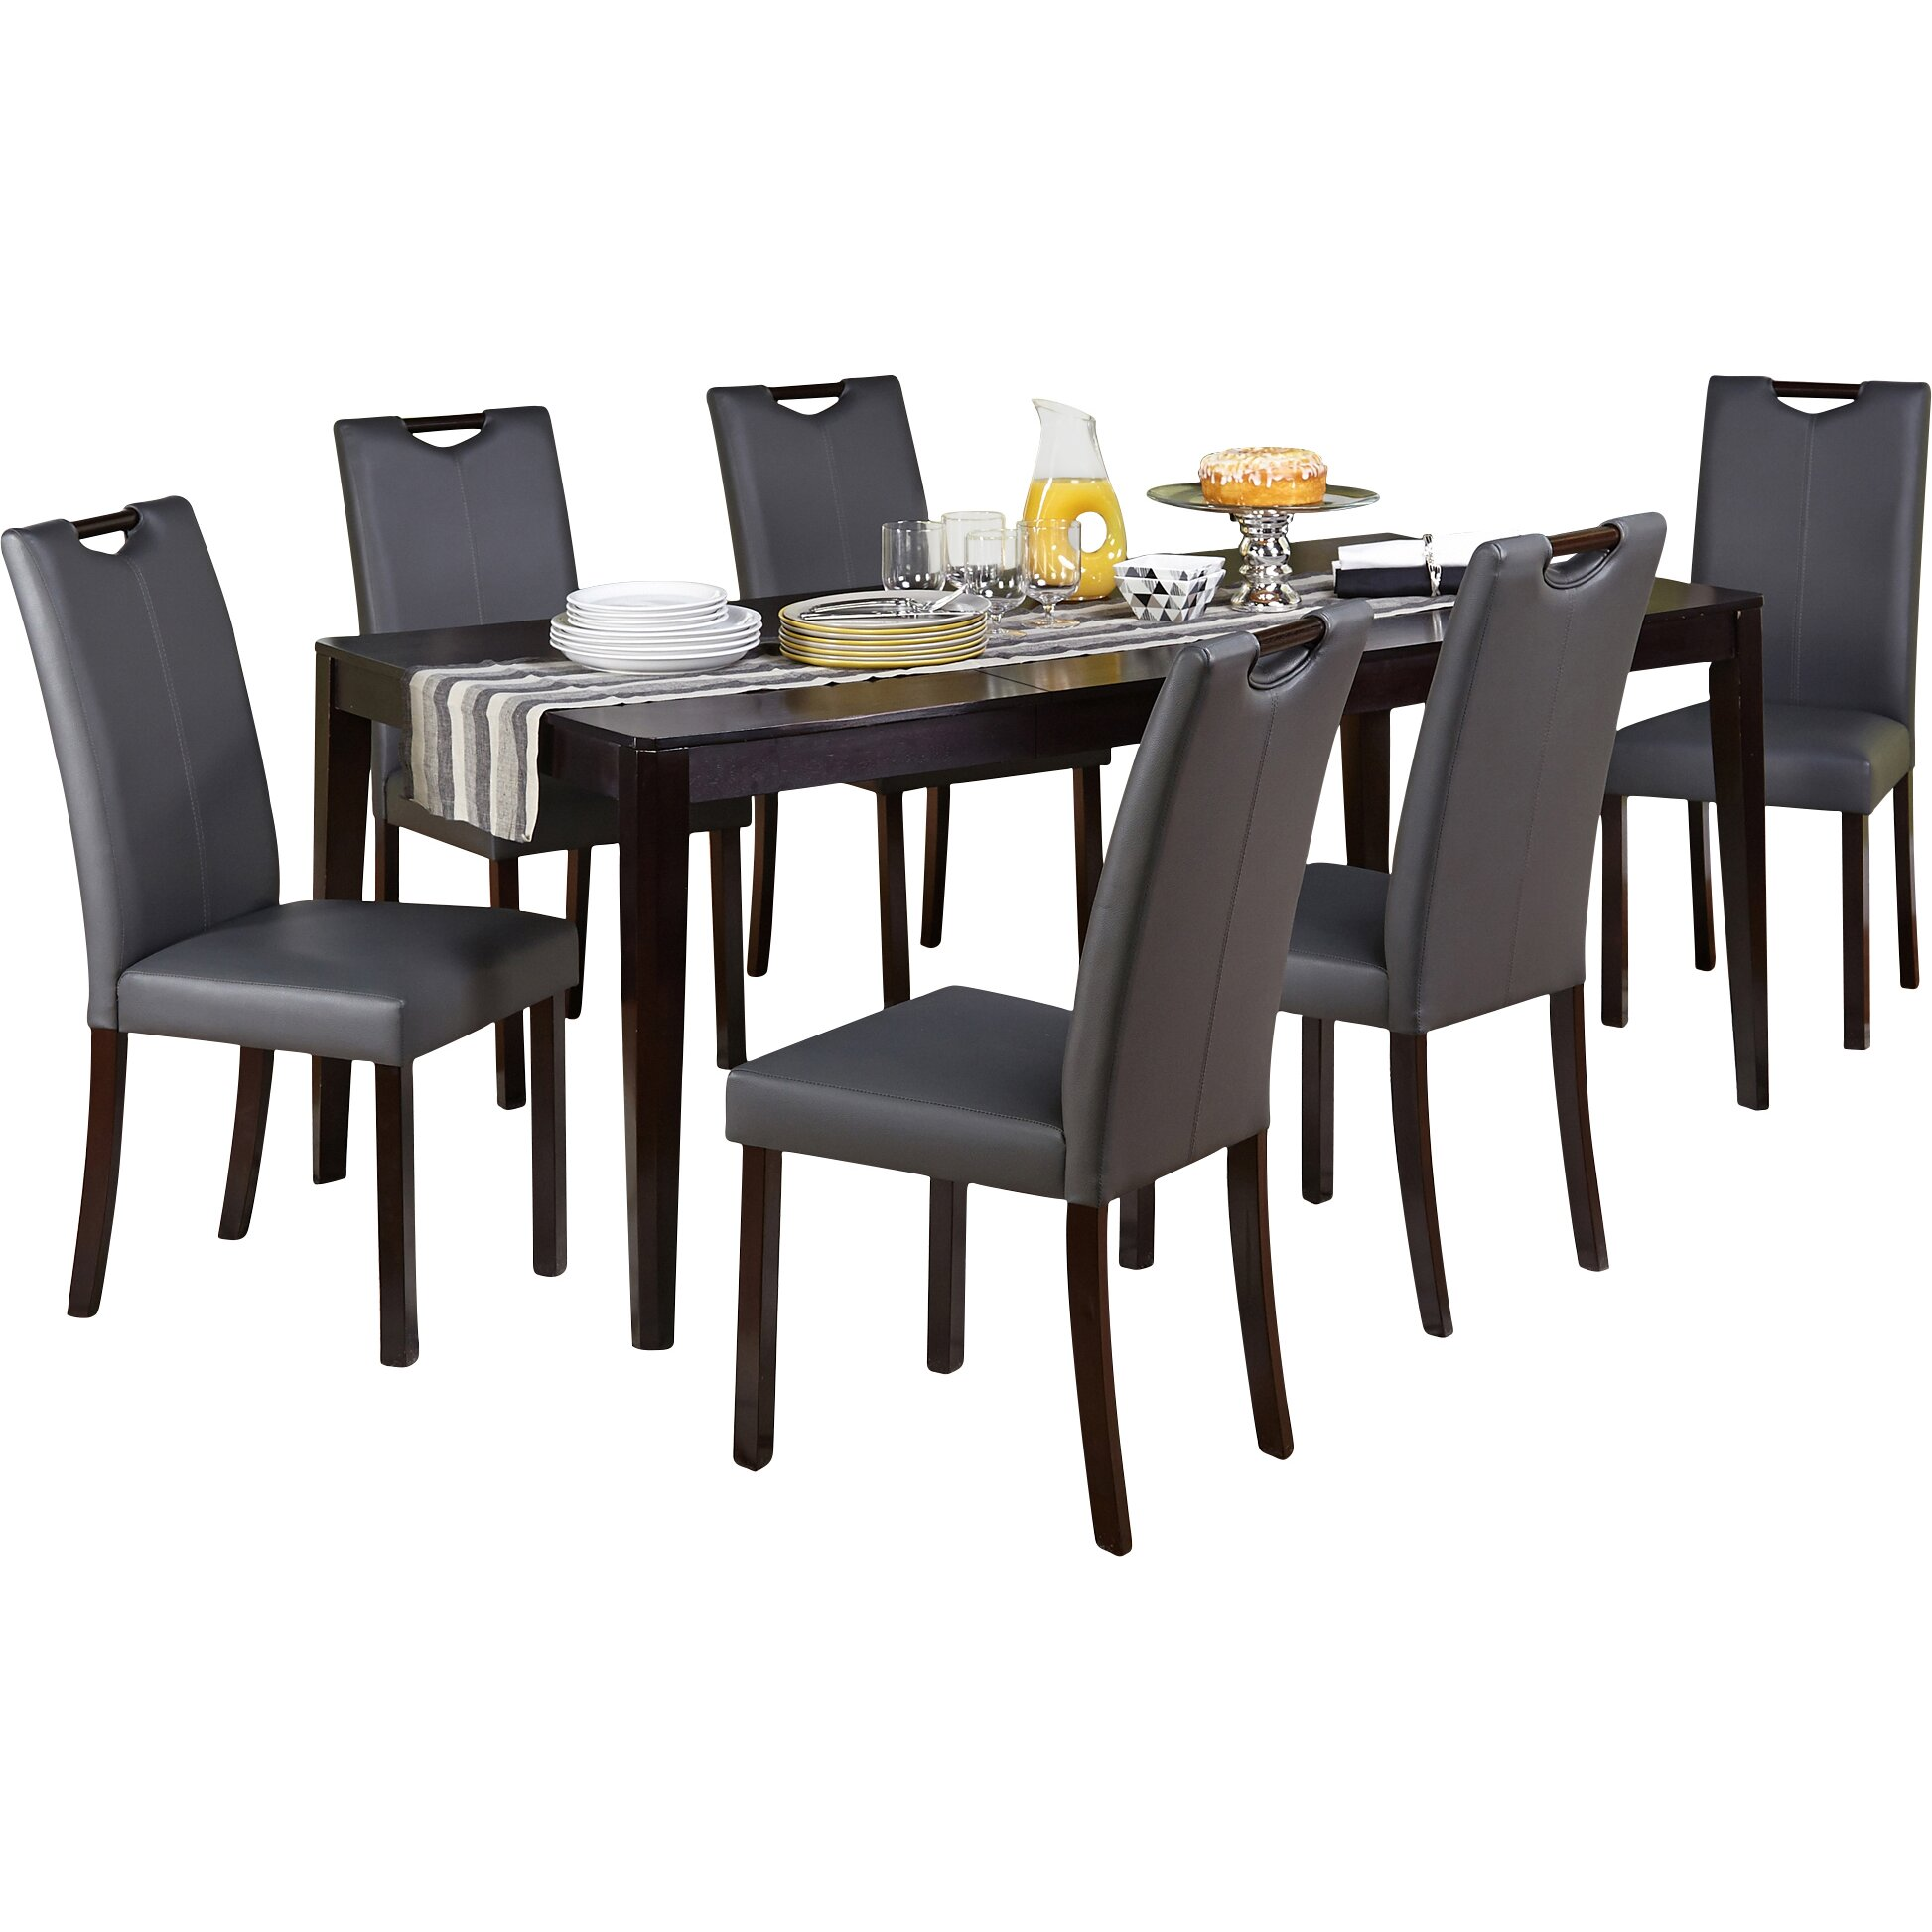 Tms tilo 7 piece dining set reviews wayfair for Furniture 7 credit reviews